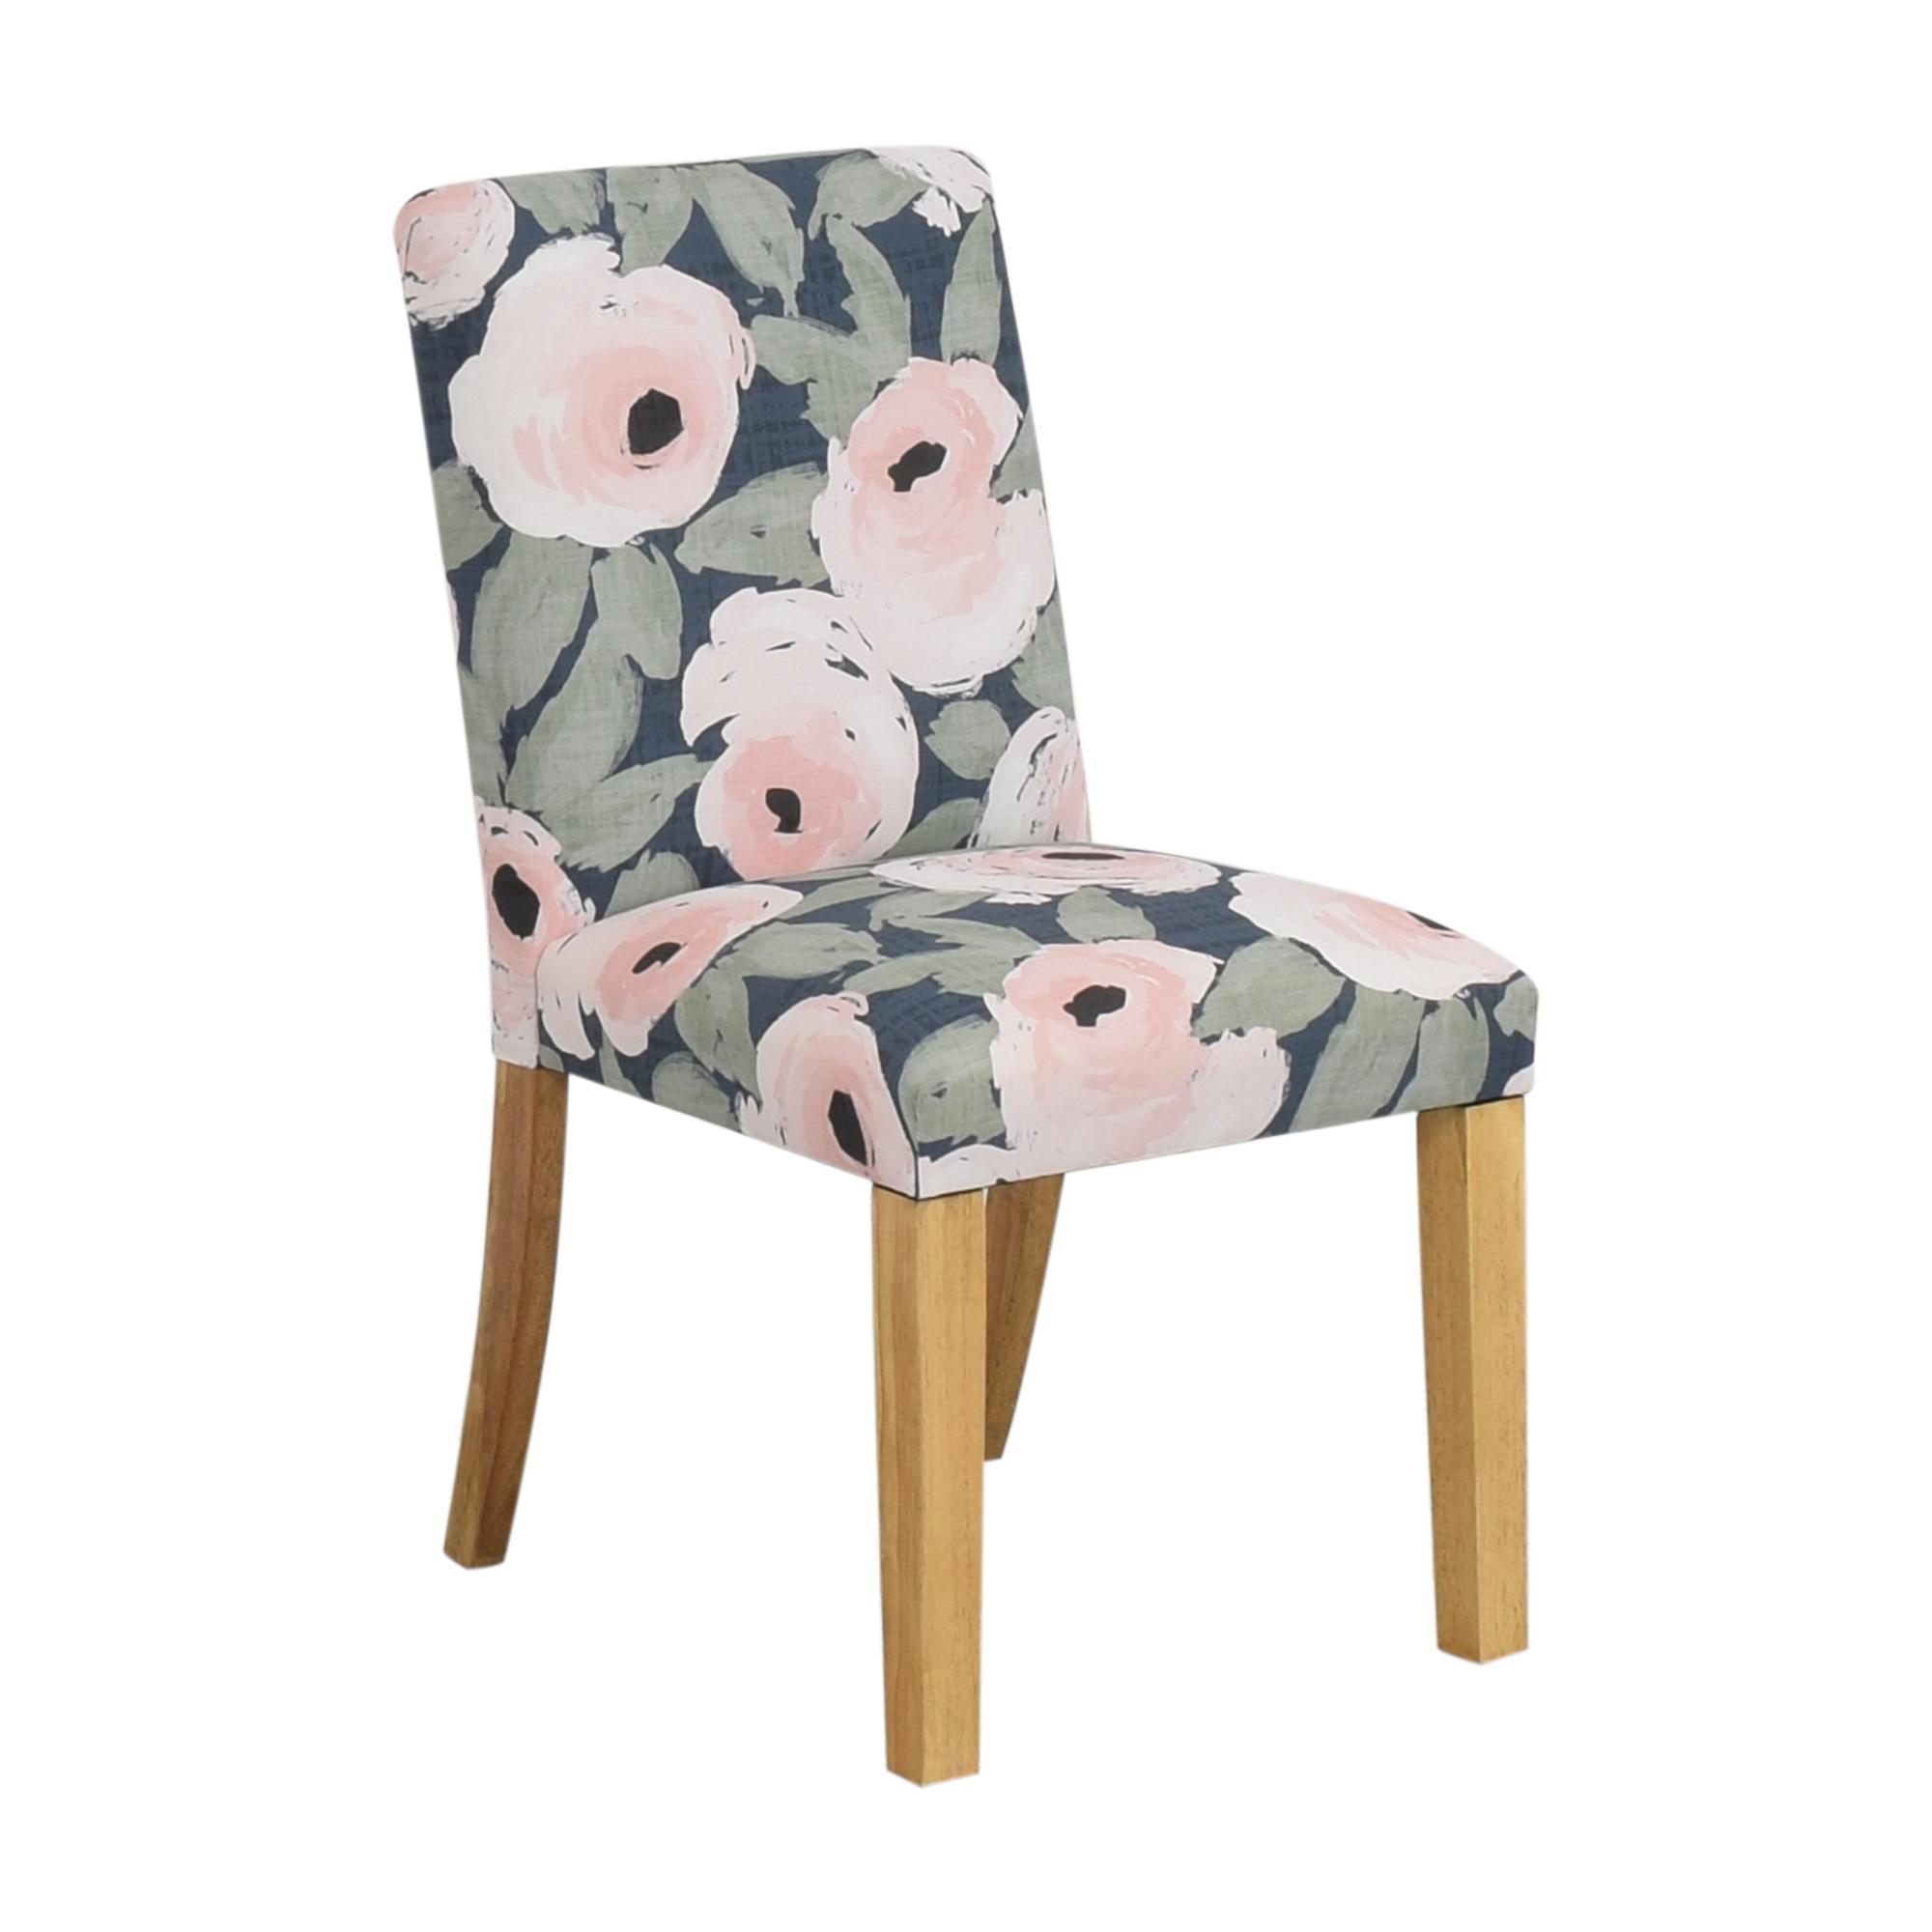 Skyline Furniture Skyline Furniture Ginny Floral Harvest Dining Chair dimensions